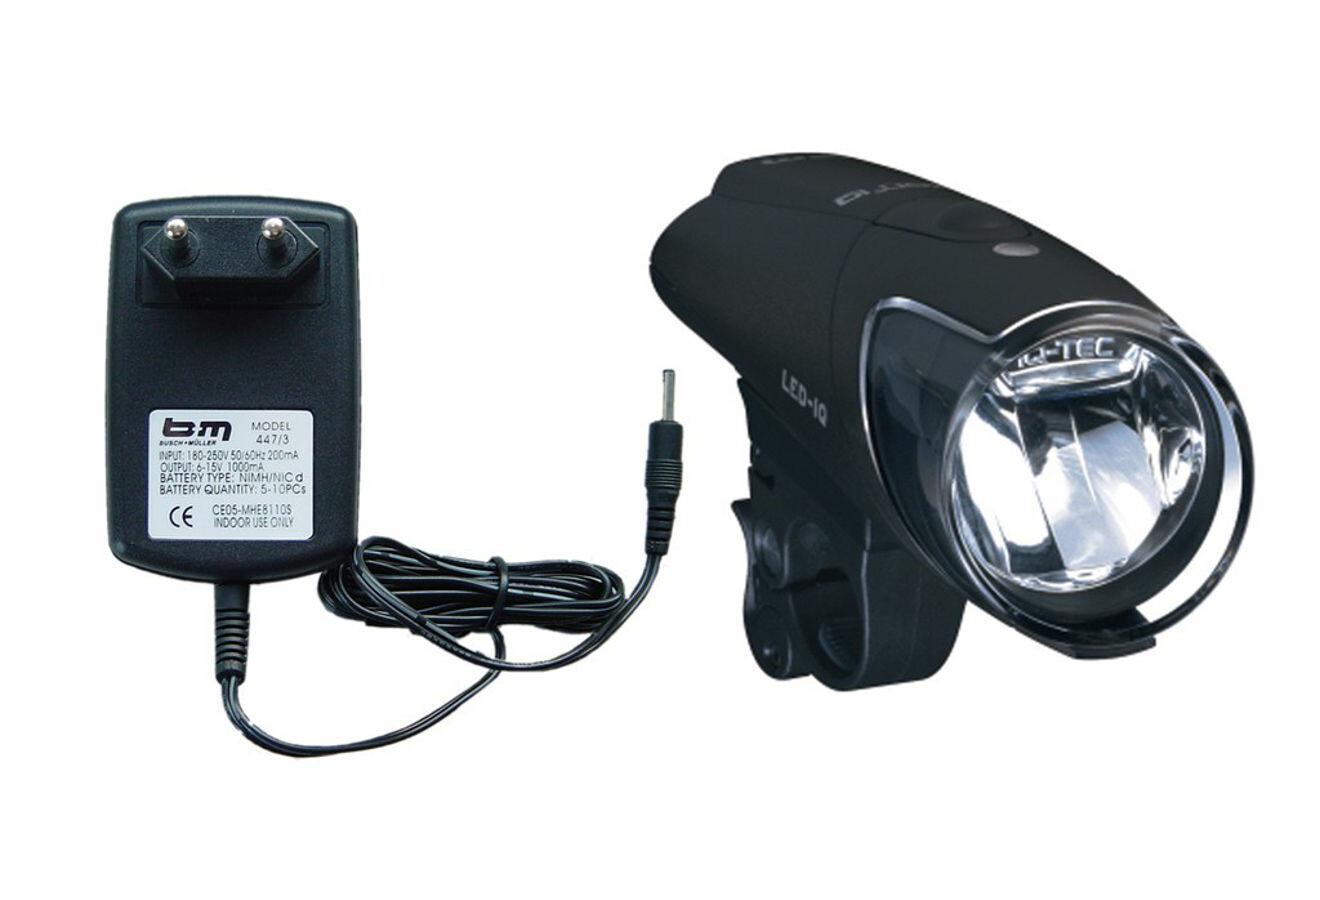 Busch /& Müller IXON Pure LED Frontal LÁMPARA incl baterías y cargador